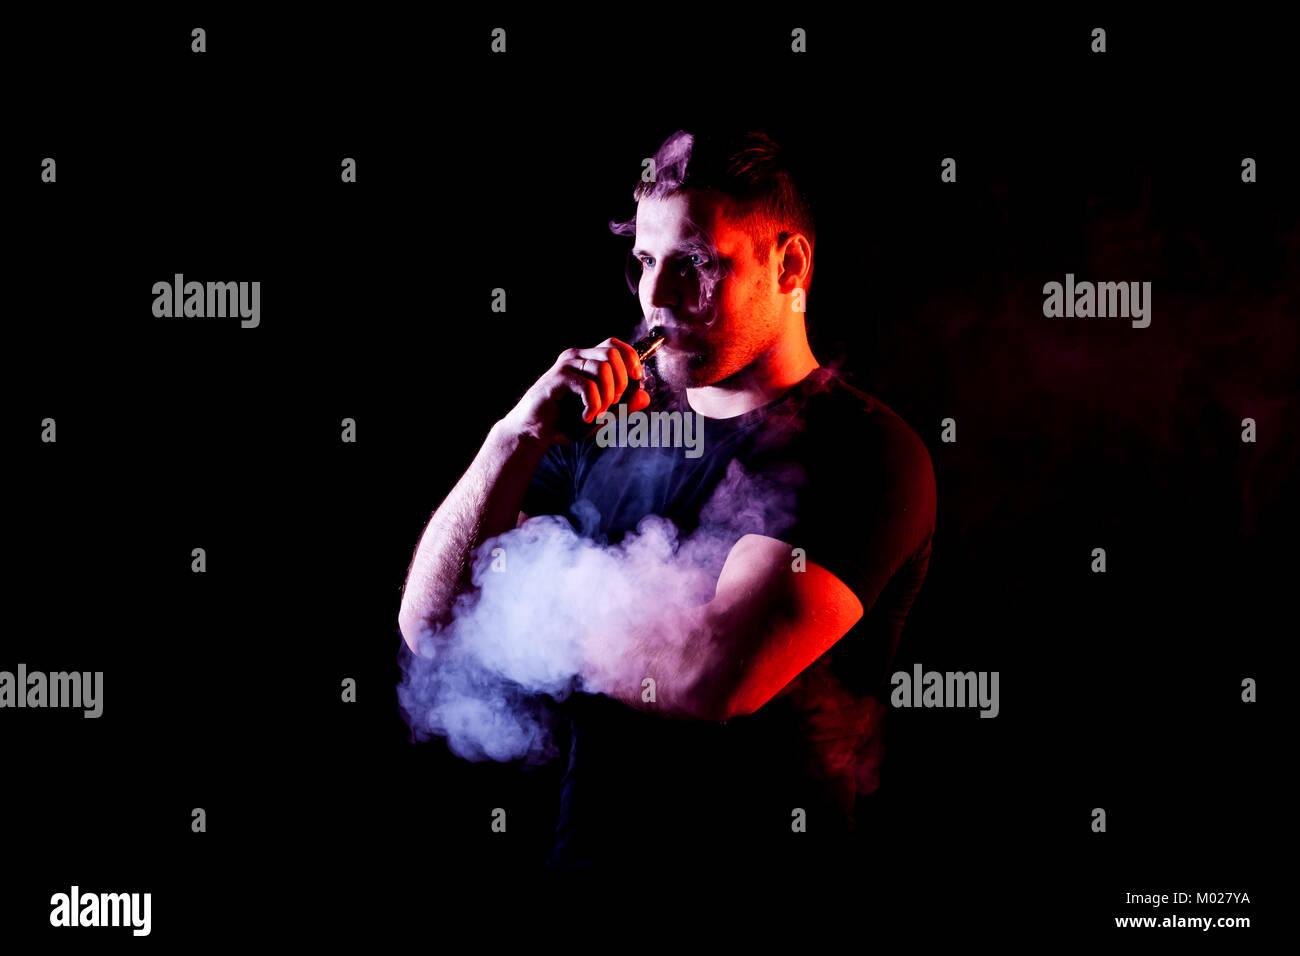 vaping man holding a mod. A cloud of vapor. Black background. - Stock Image